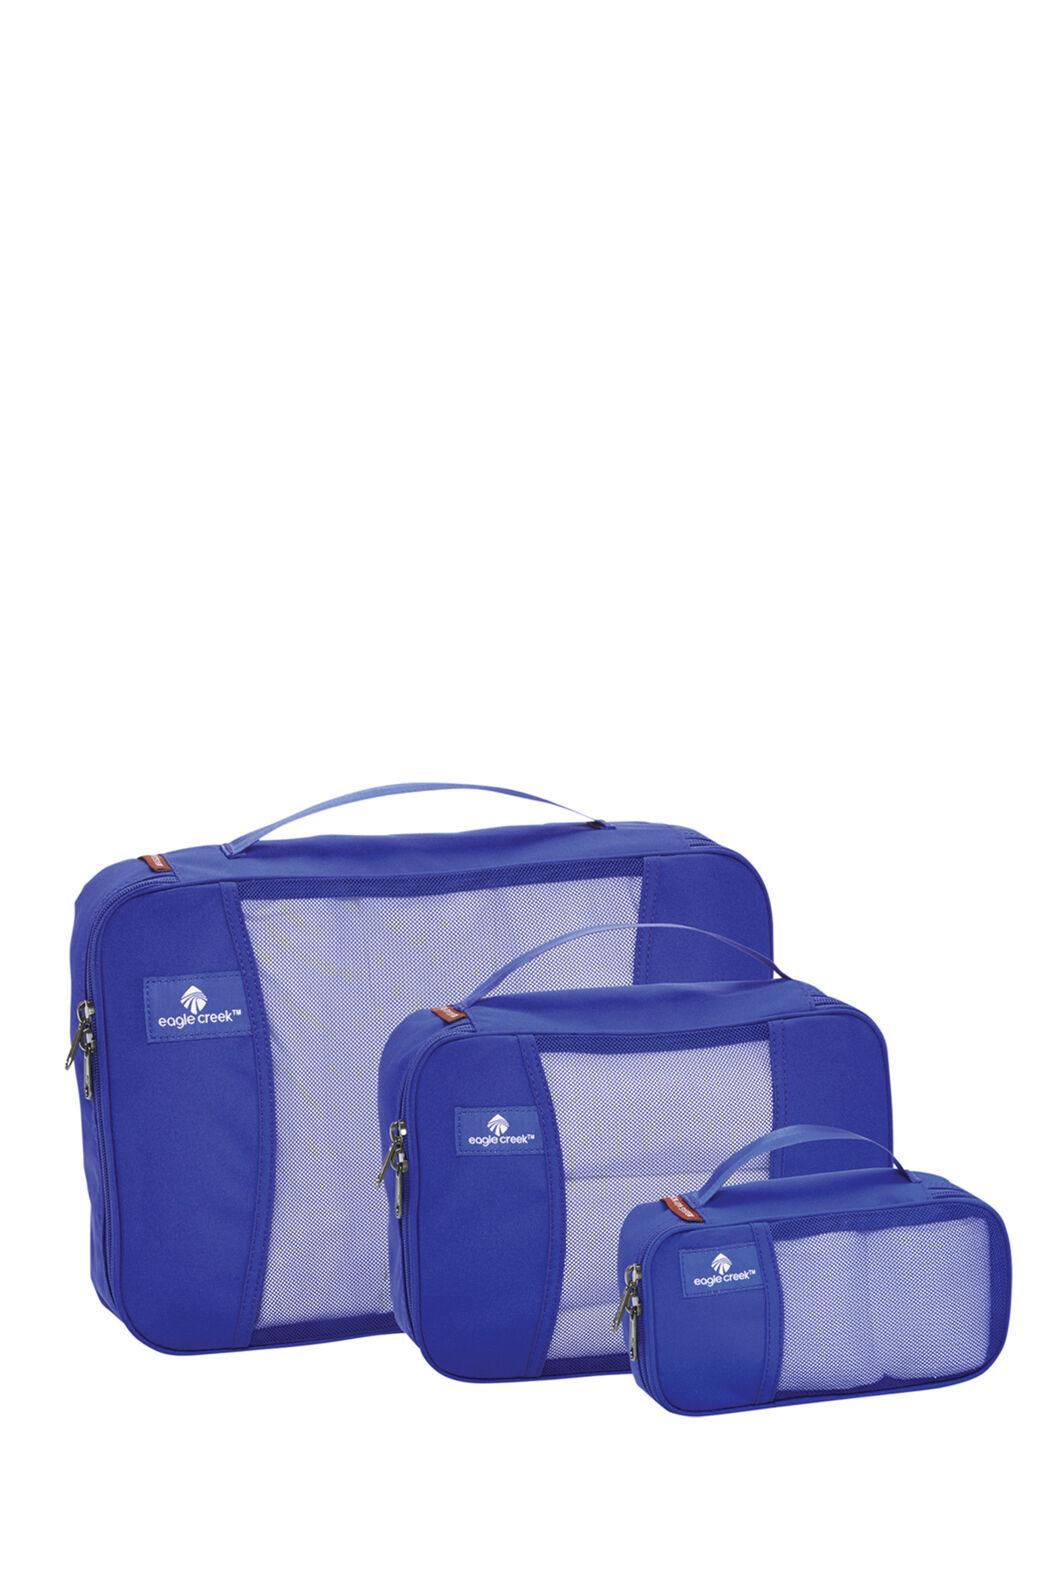 Eagle Creek Pack-It Cube Set, Blue, hi-res